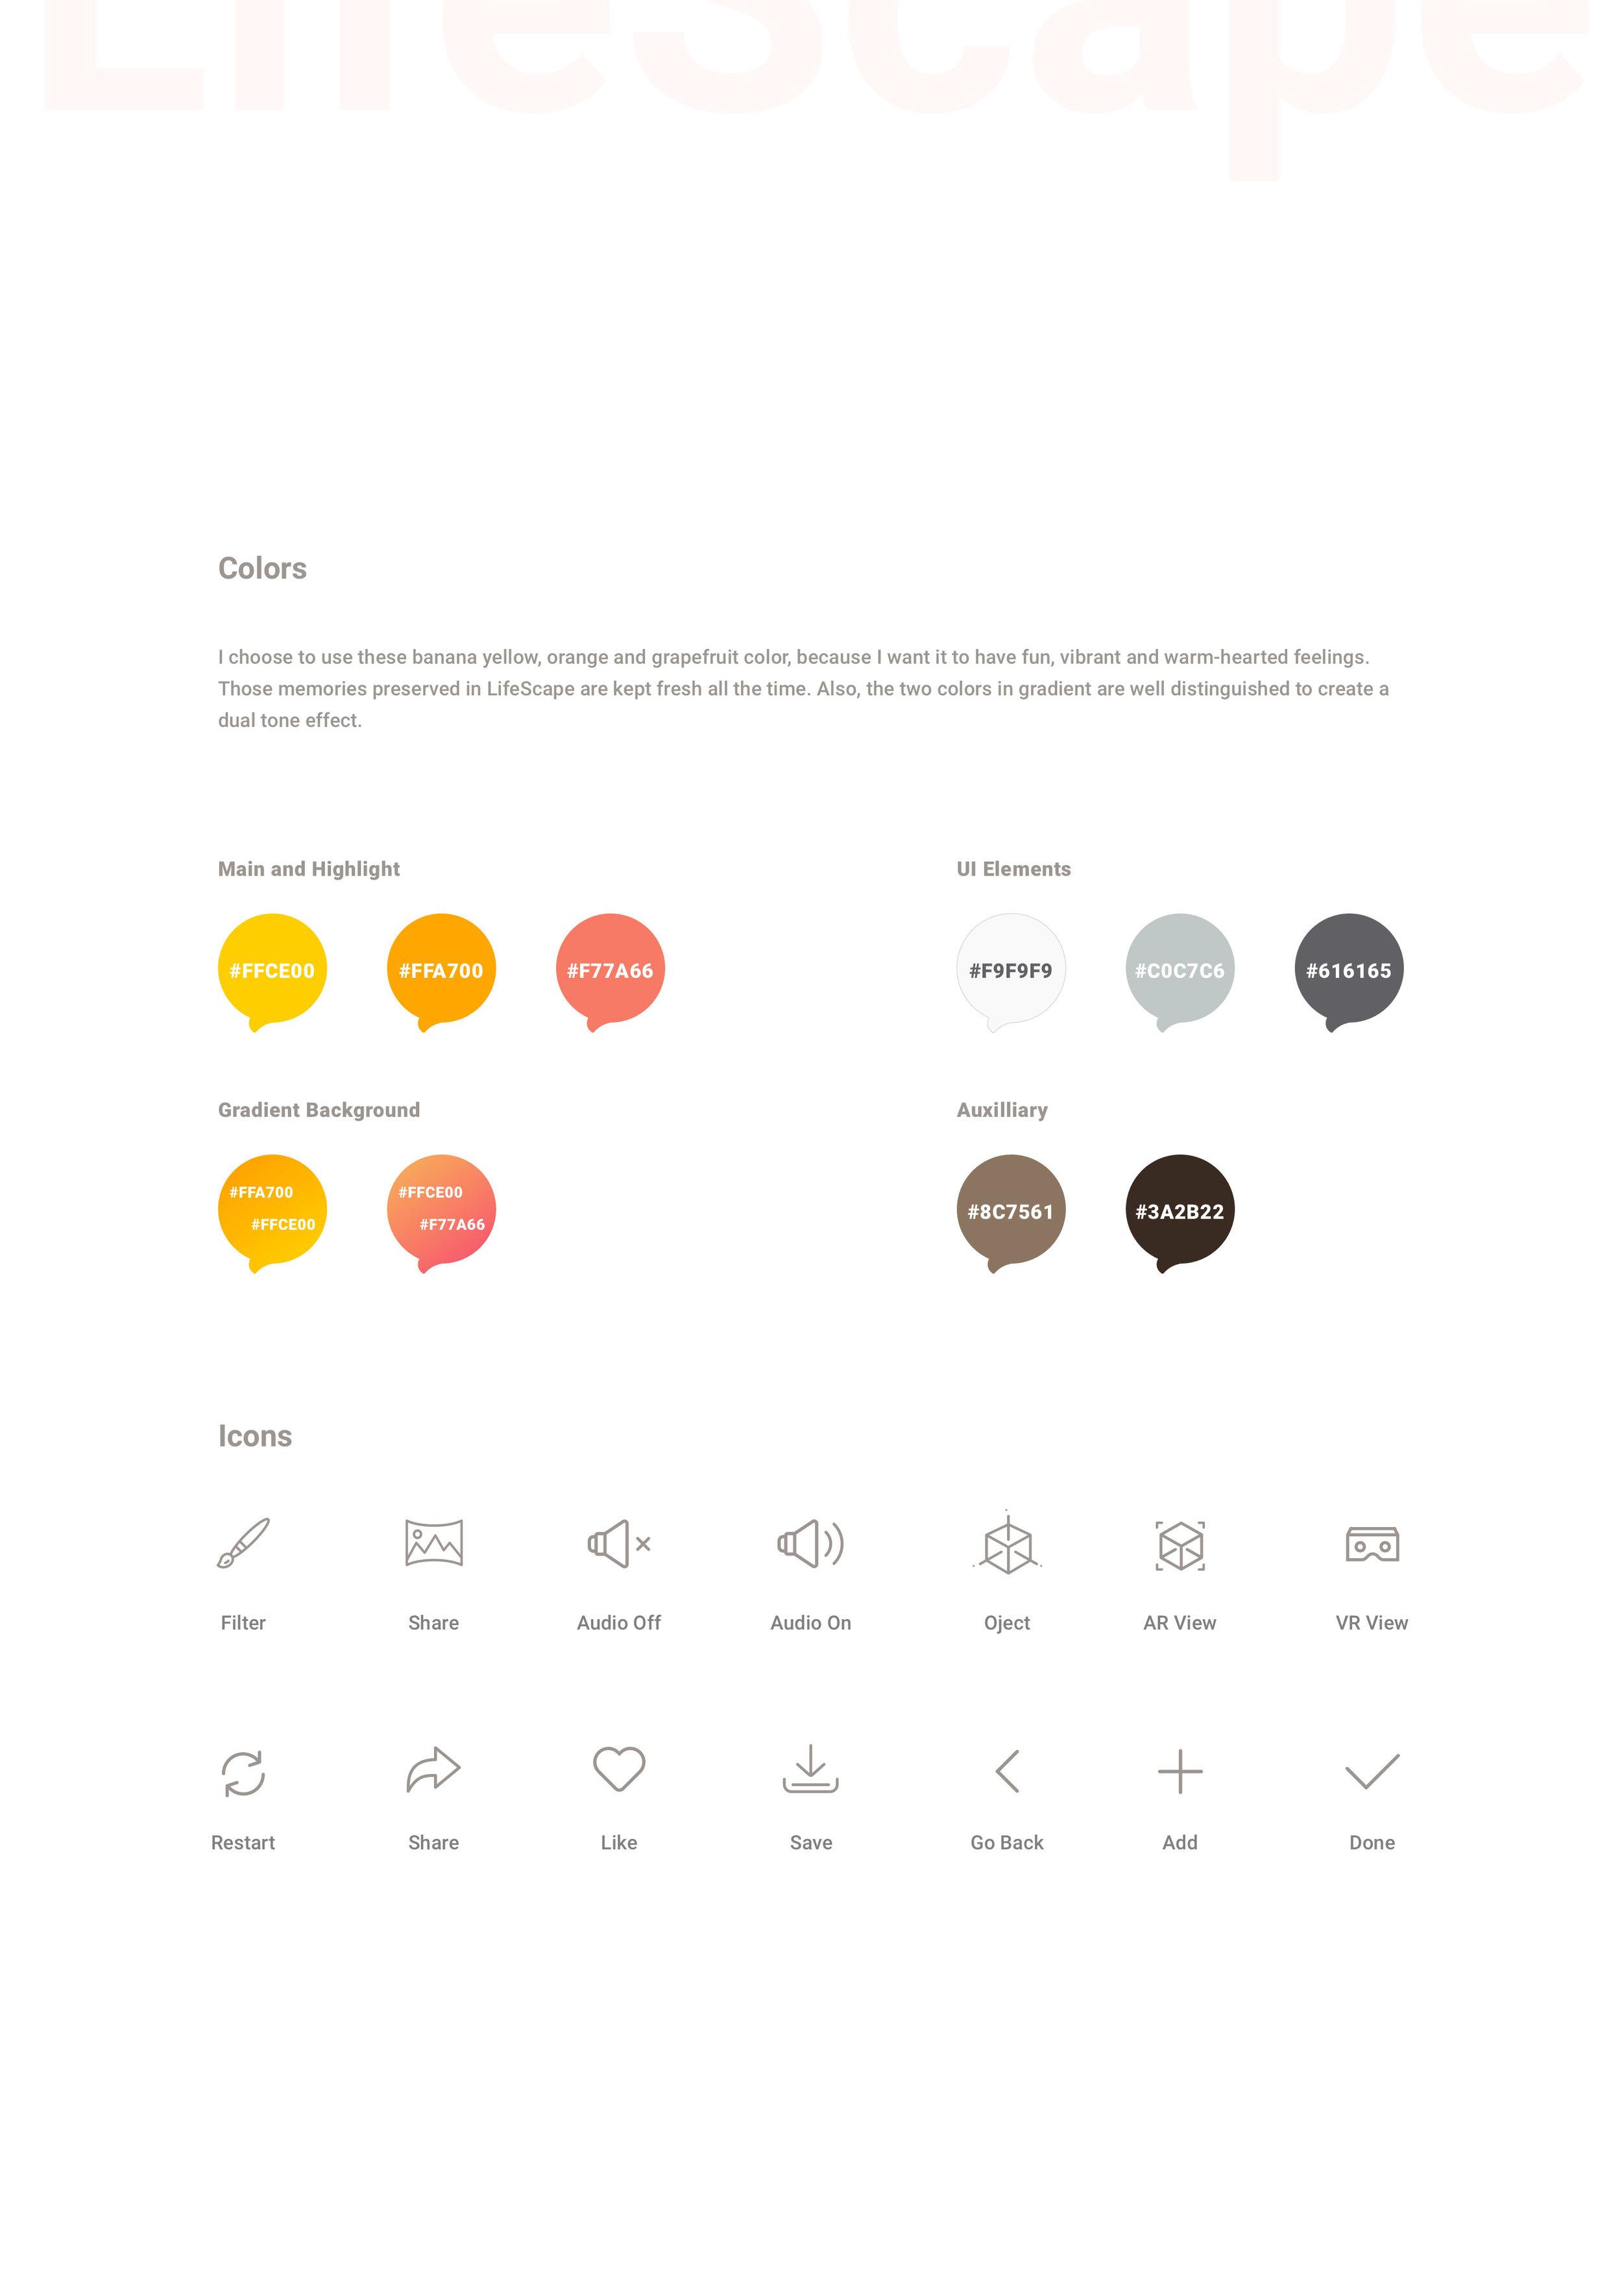 StyleGuide_color.jpg